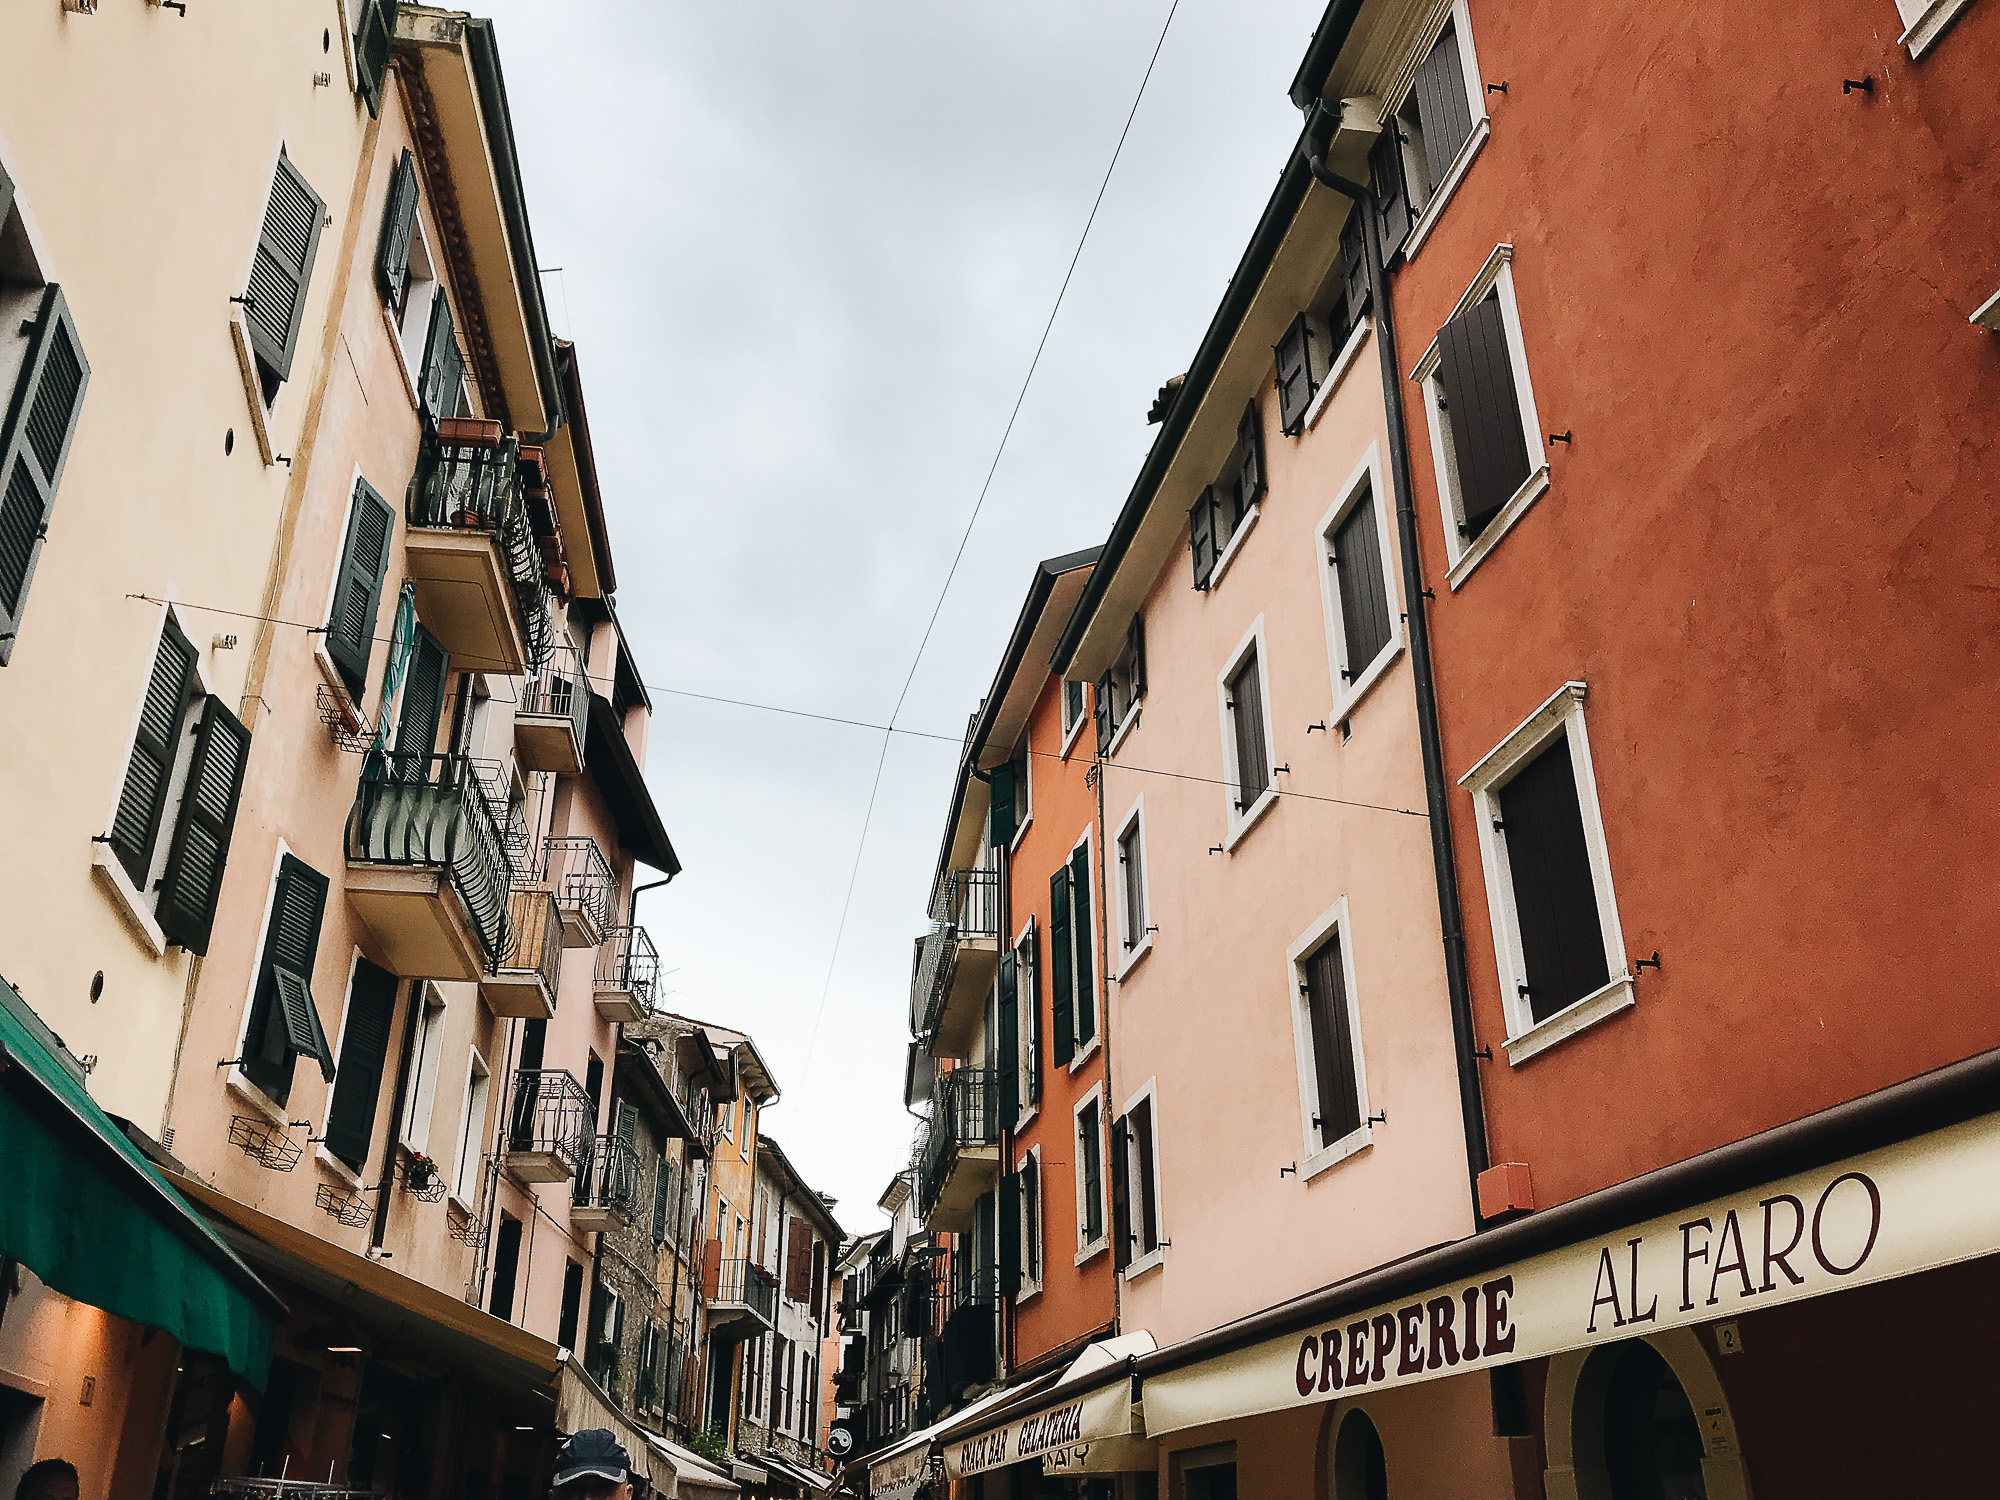 OurBeautifulAdventure-LakeGarda-Italy-Blog-6401.jpg